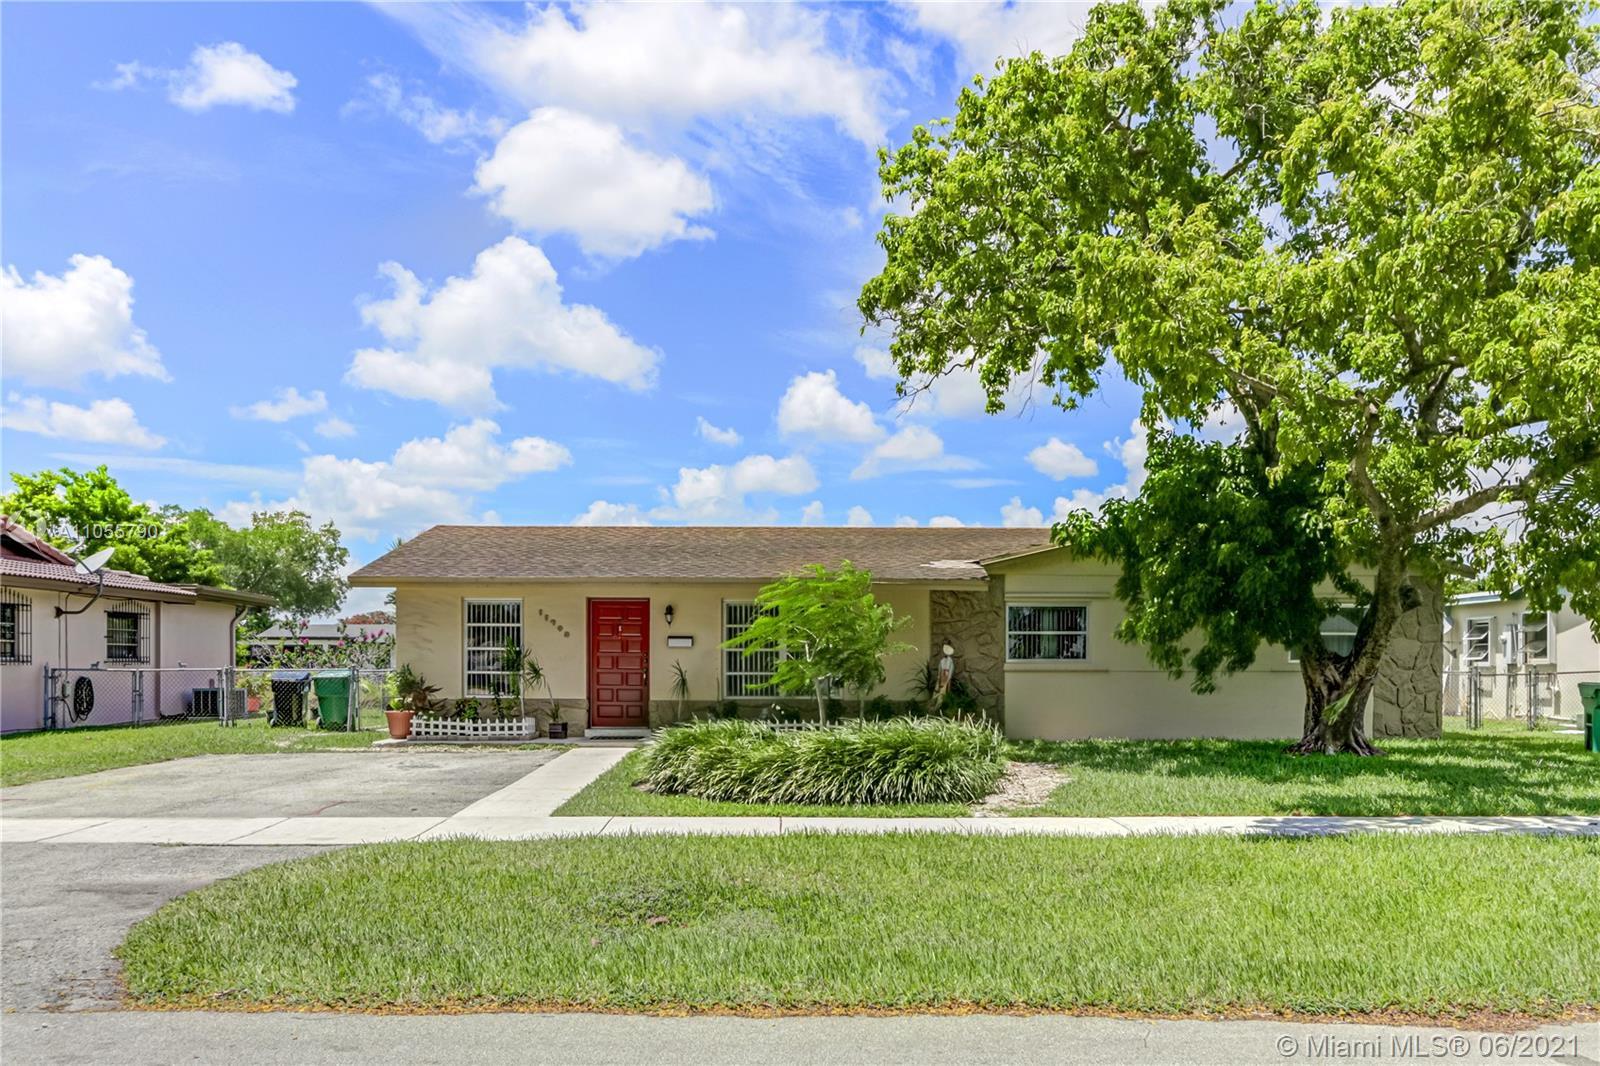 Southern Estates - 11793 SW 34th St, Miami, FL 33175